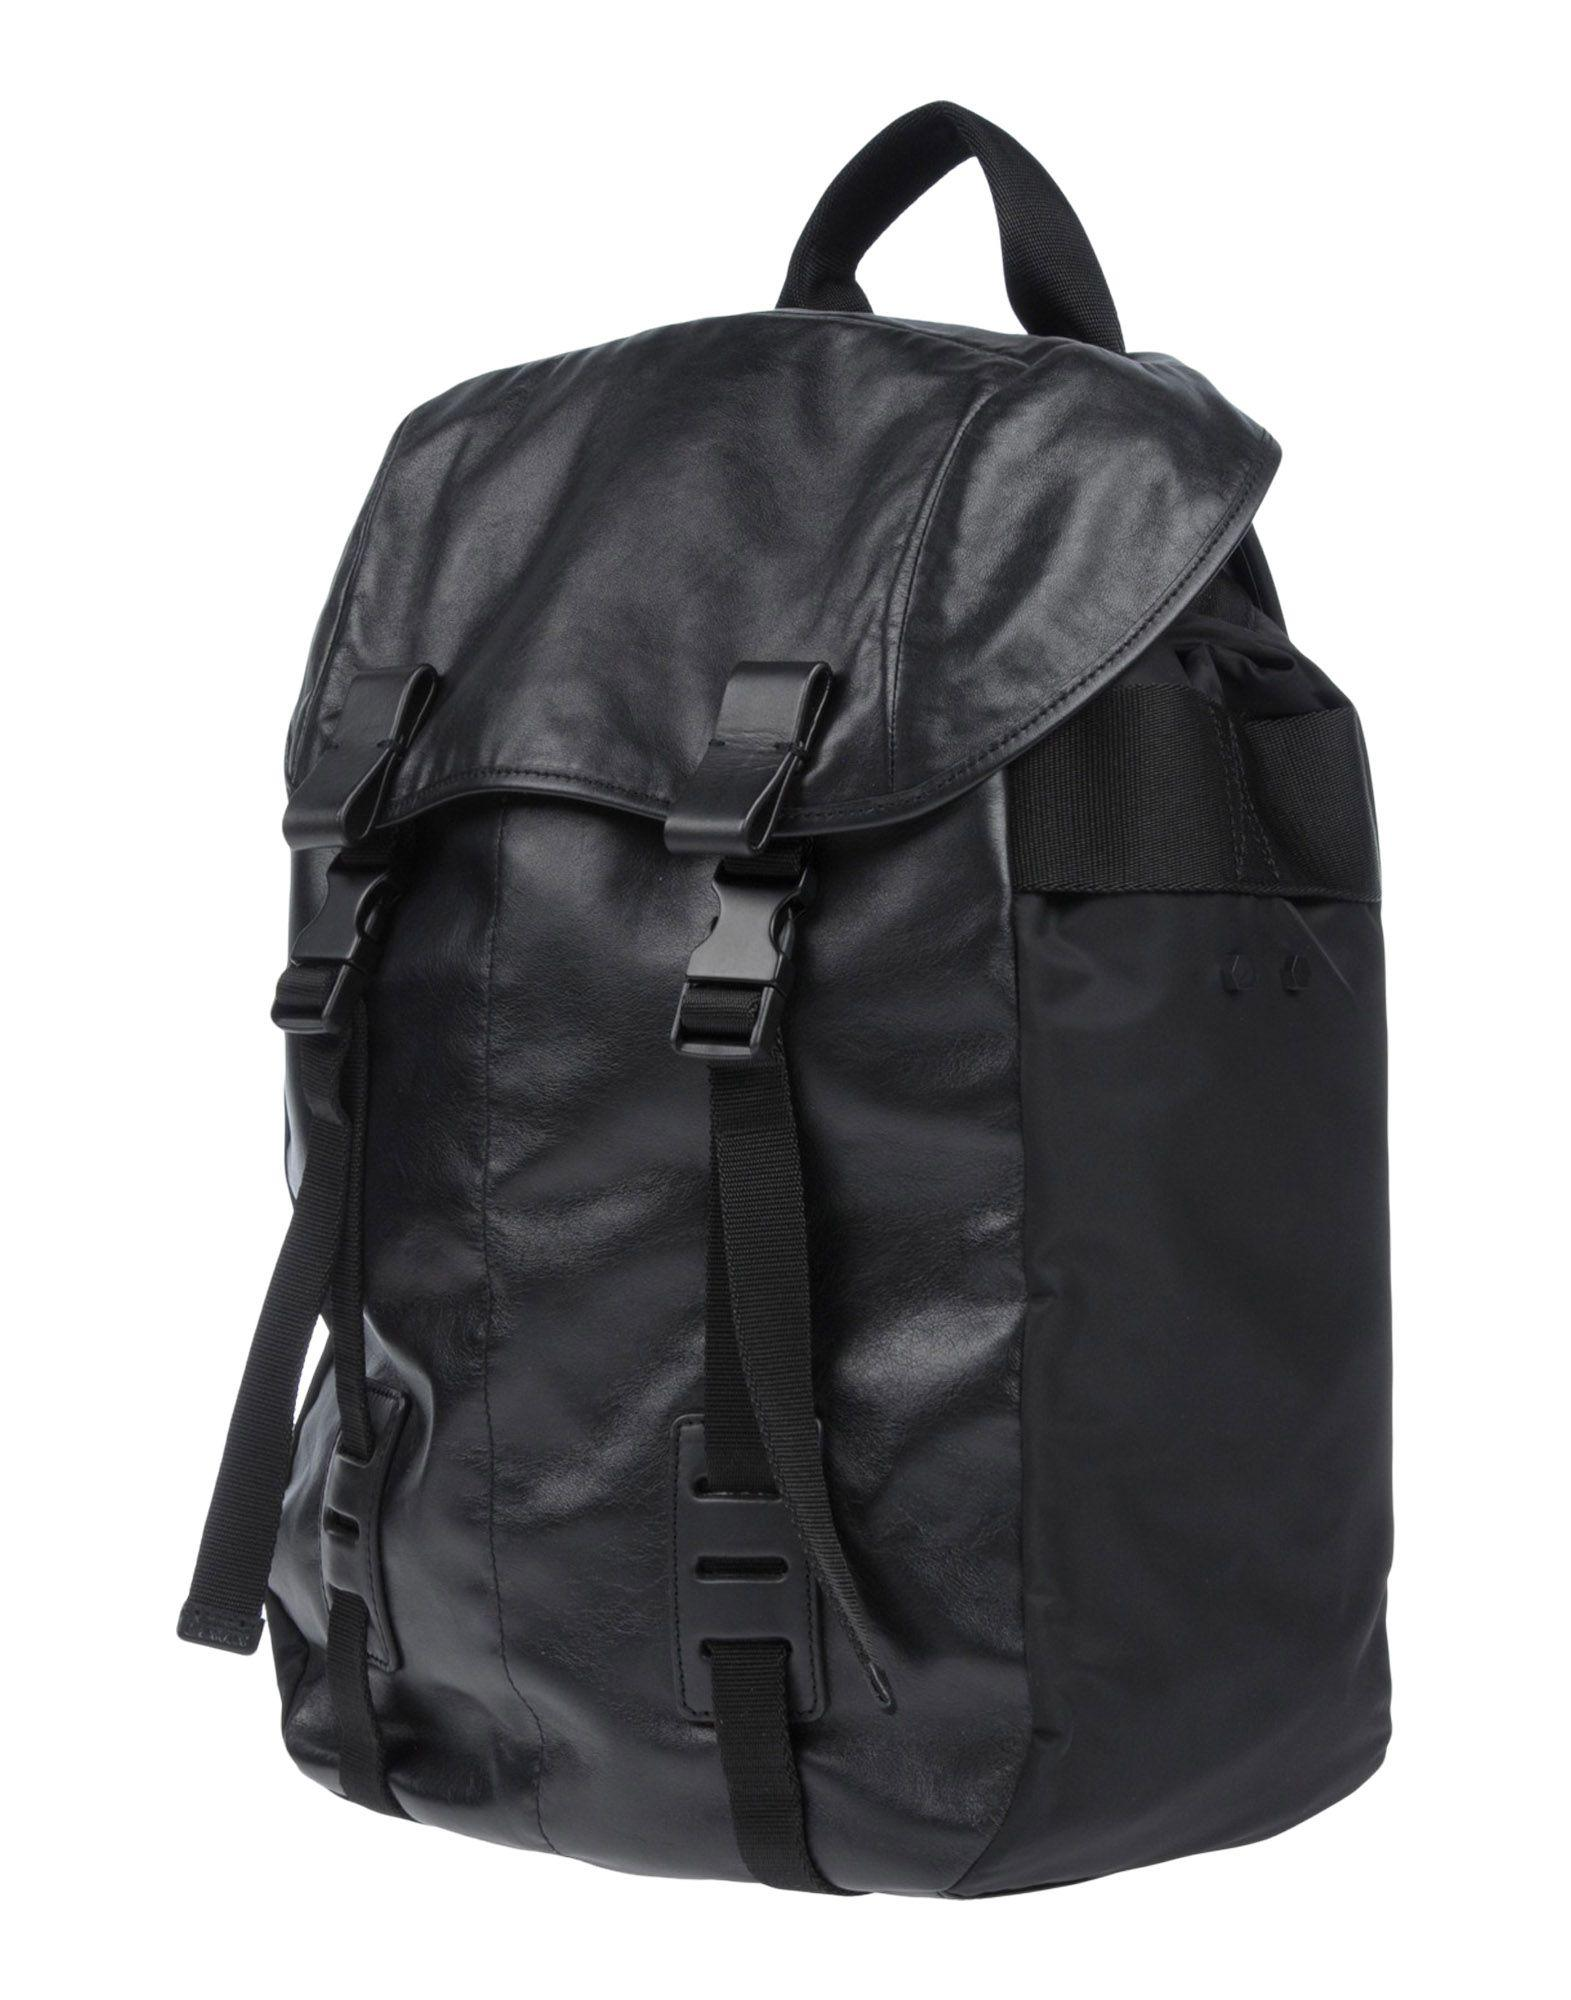 Lanvin Backpacks & Fanny Packs In Black